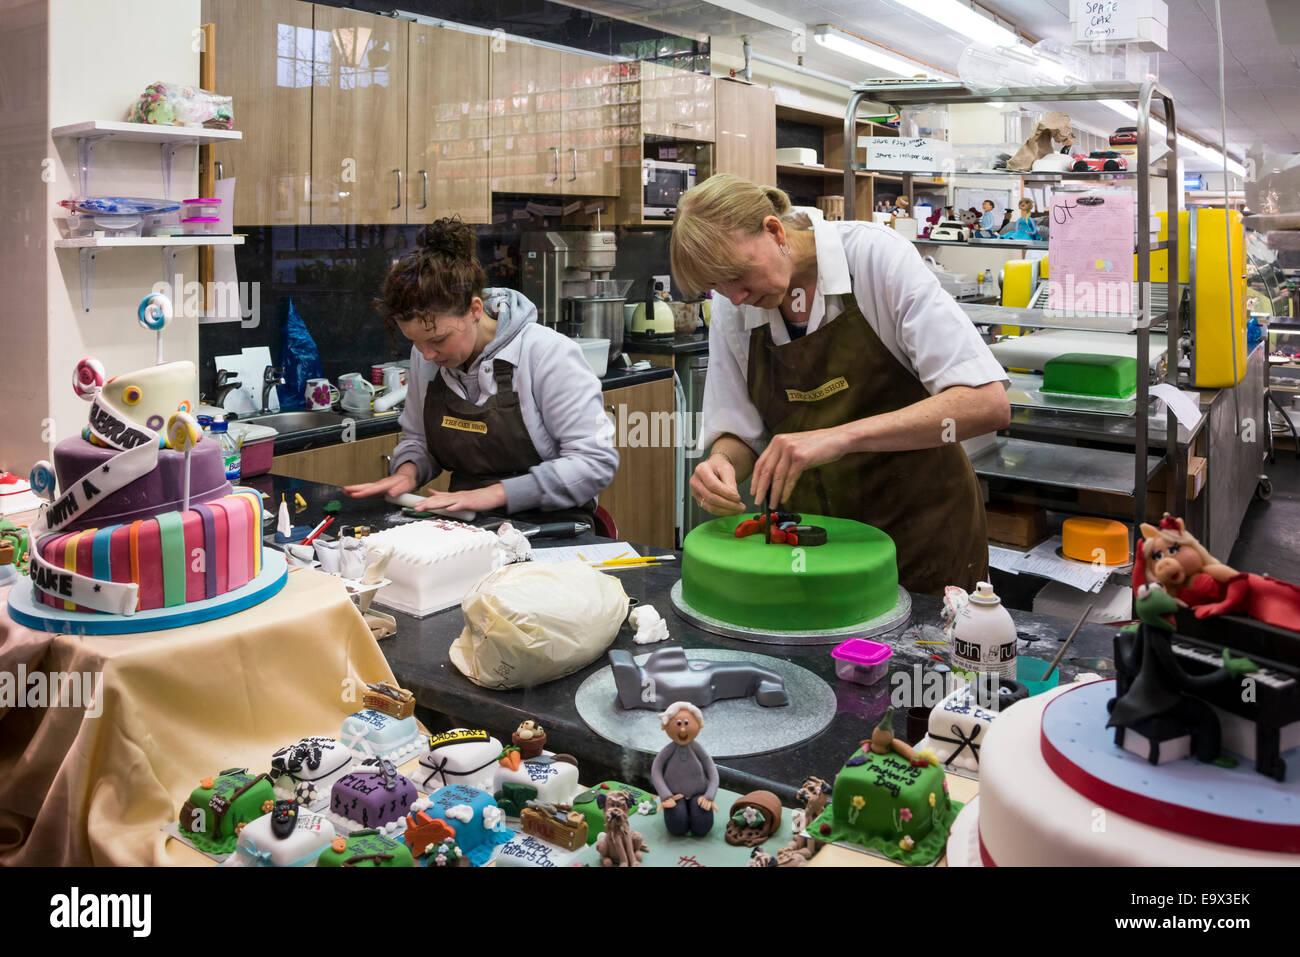 Wedding Cake Shop Oxford Covered Market